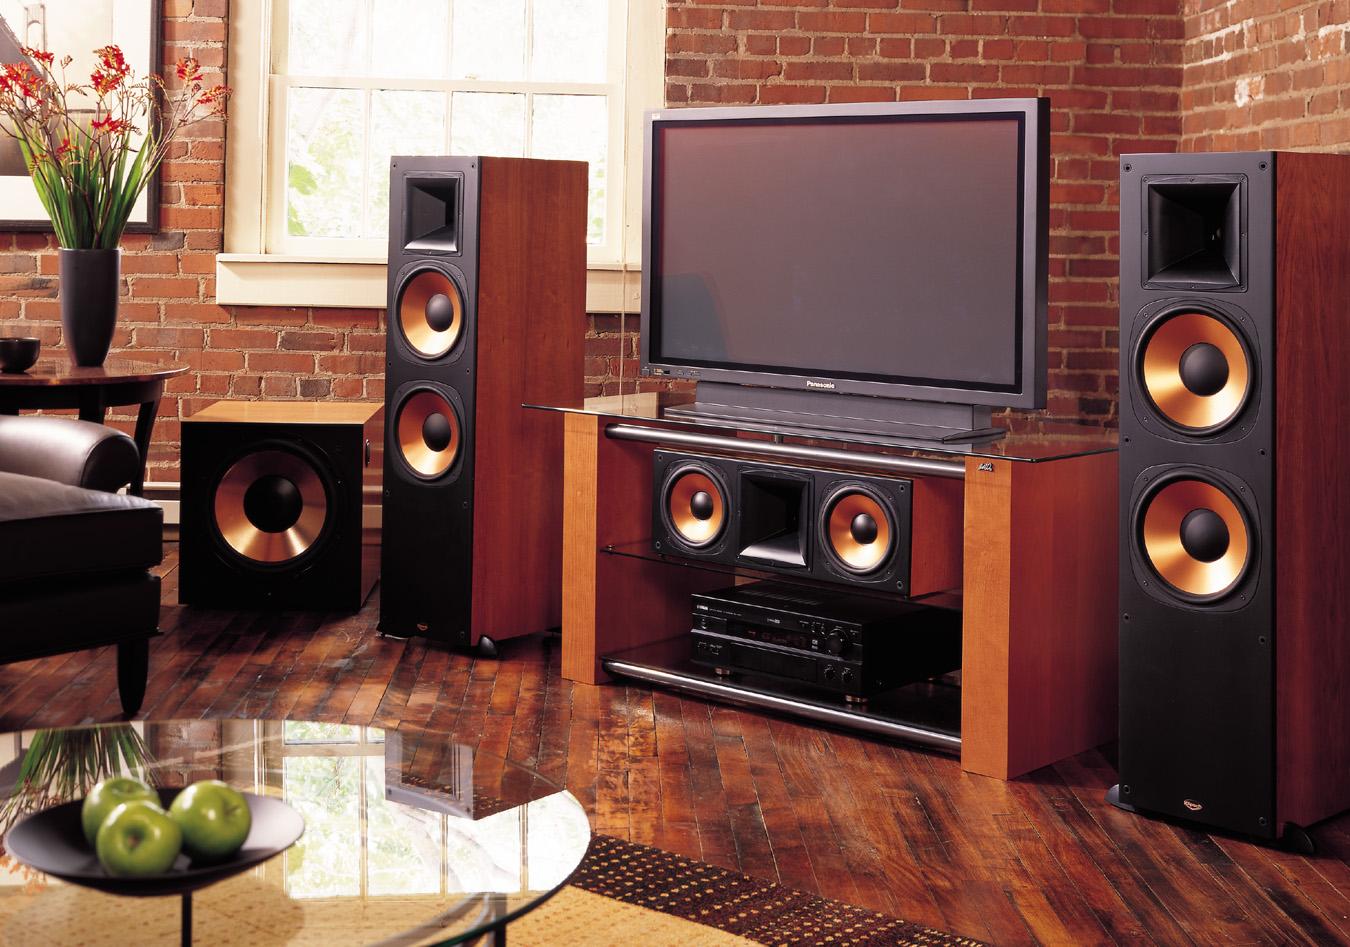 Аудиосистема для дома